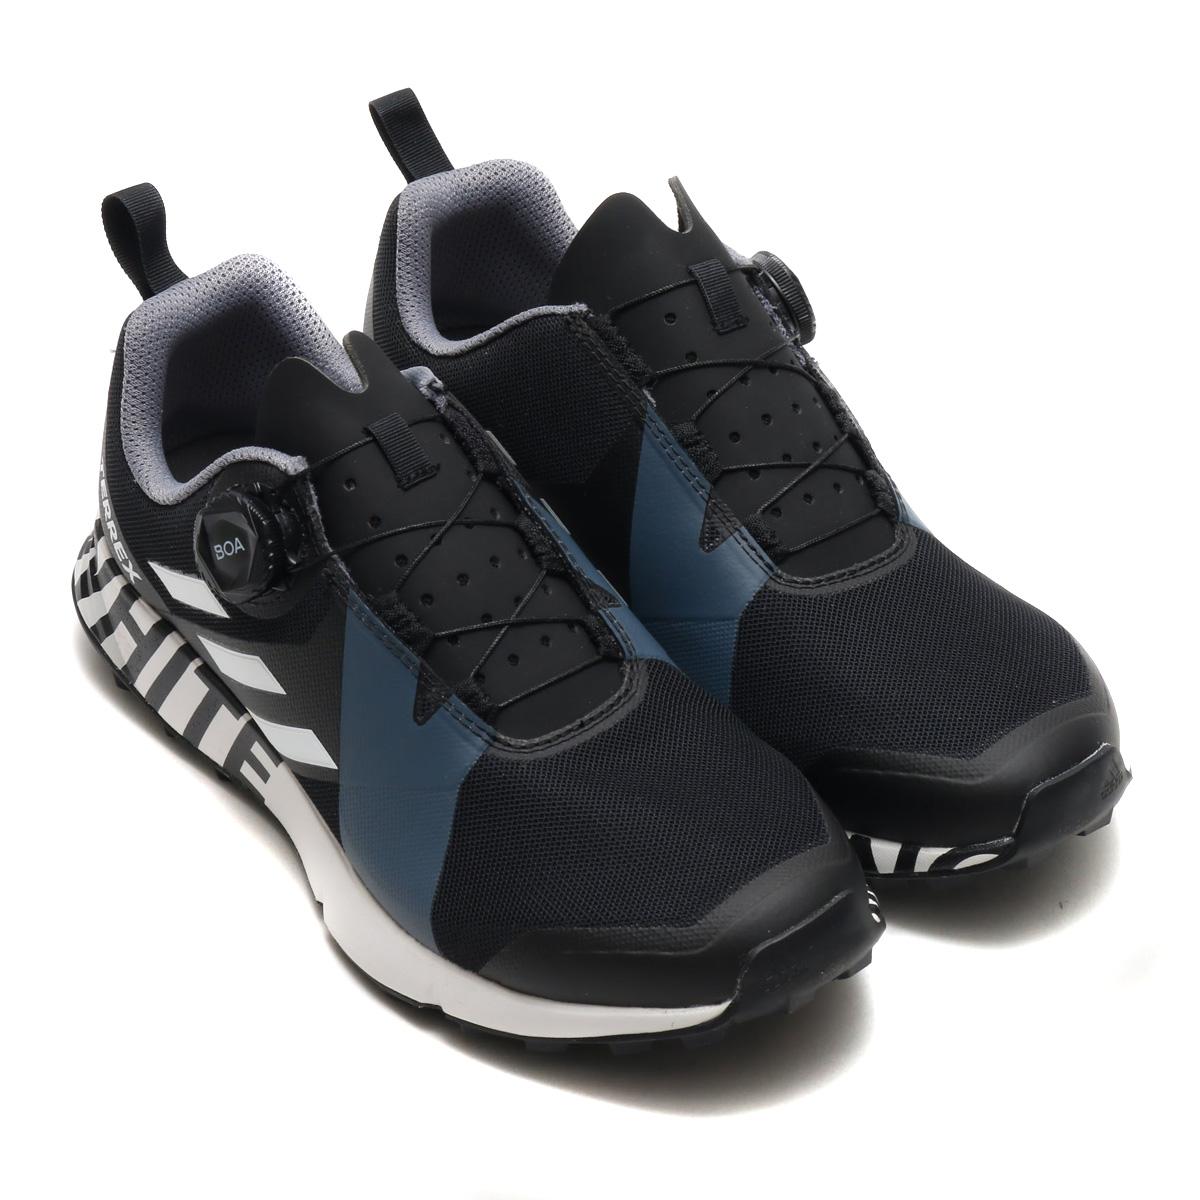 adidas WM TERREX TWO BOA (アディダス WM テレックス TWO BOA) Core Black/Running White/Core Black【メンズ スニーカー】